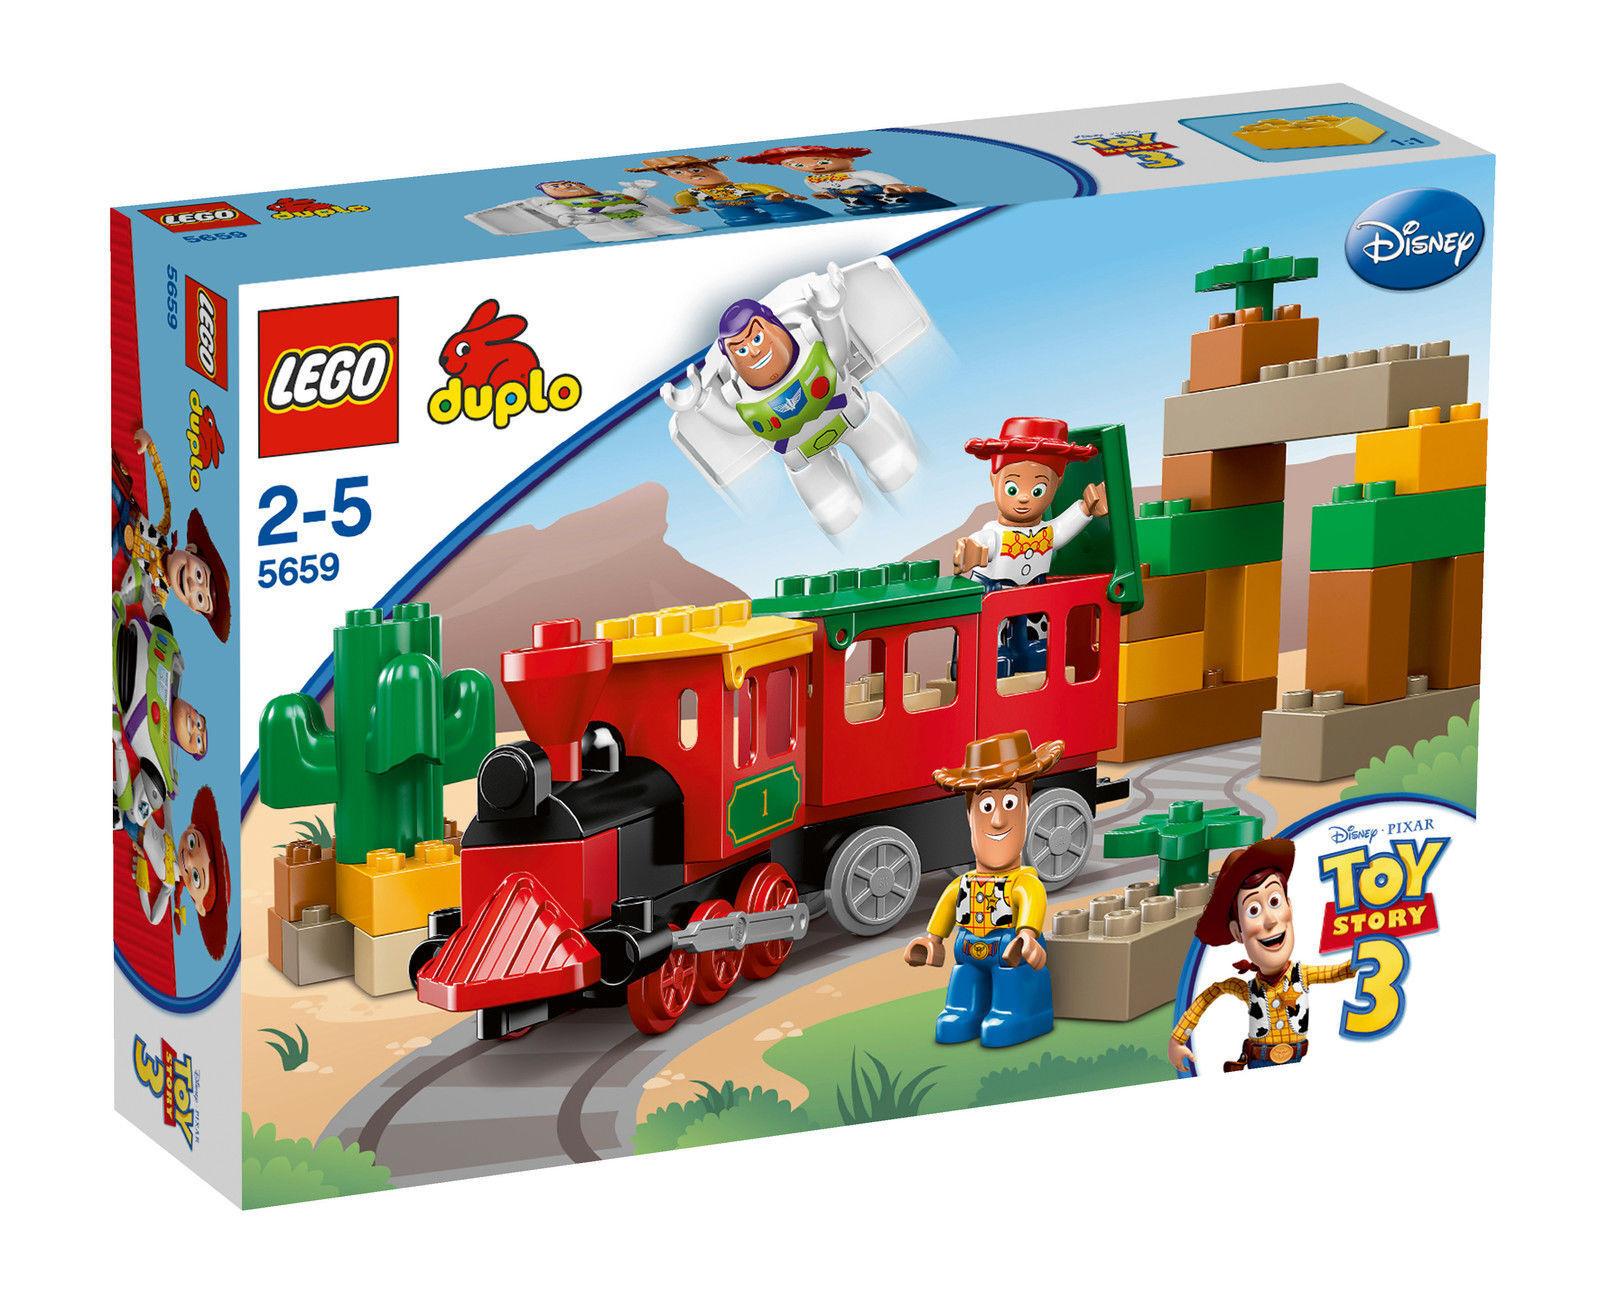 LEGO 5659 Duplo Toy Story Die große Eisenbahnjagd  NEU OVP NEW MISC